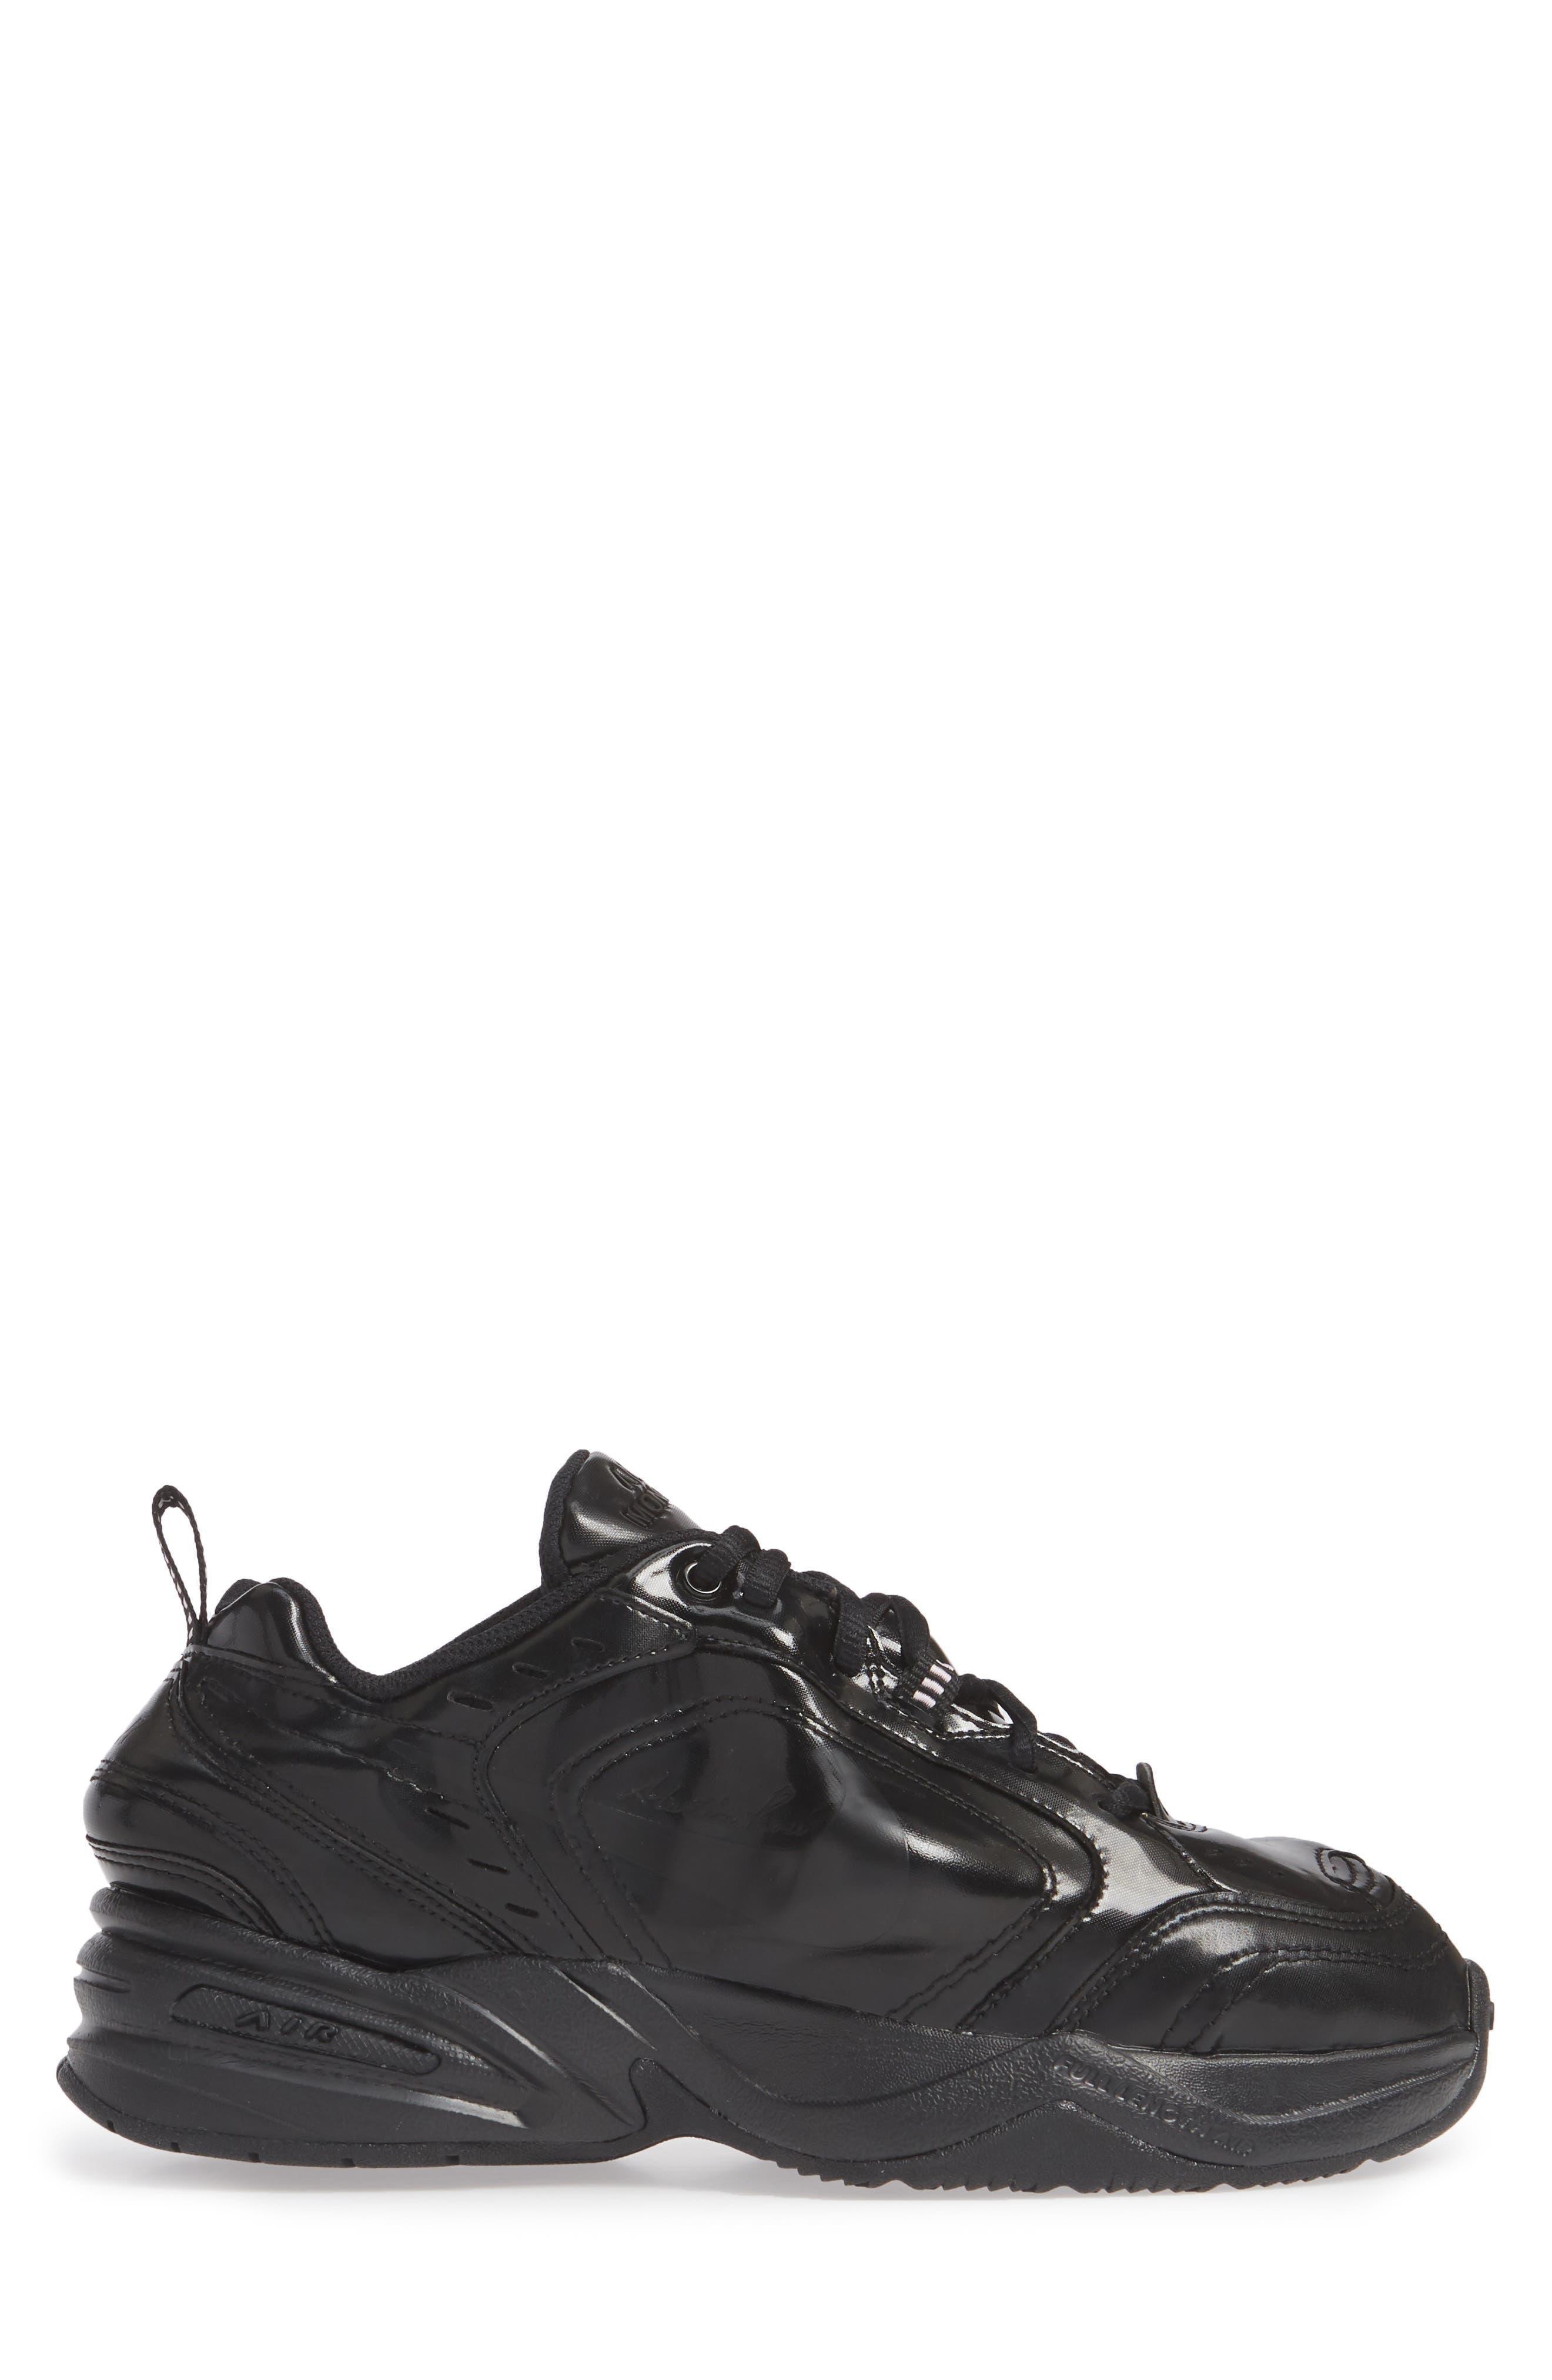 x Martine Rose Air Monarch IV Sneaker,                             Alternate thumbnail 3, color,                             BLACK/ SOFT PINK